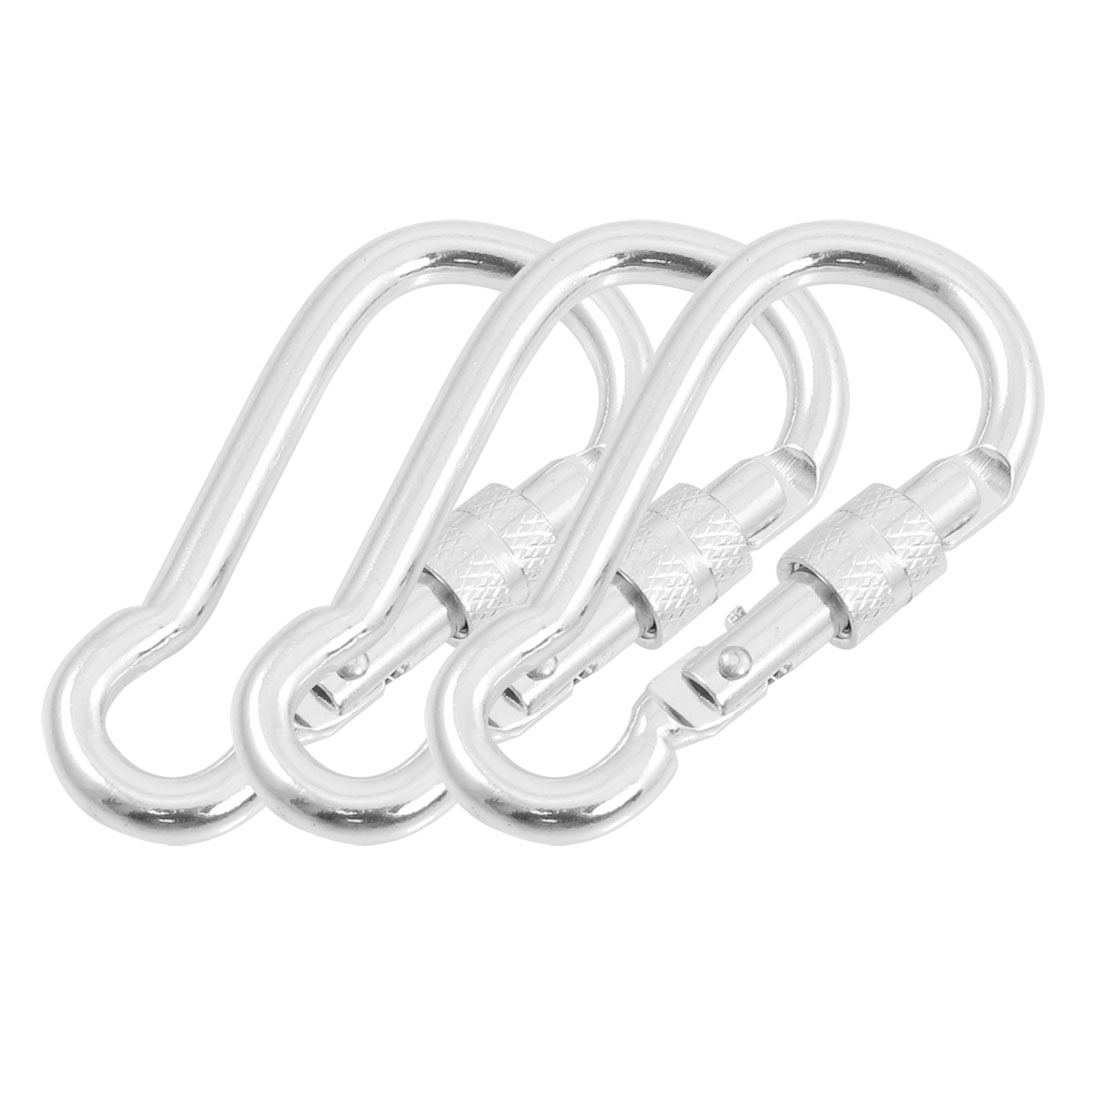 3 Pcs 7cm Silver Tone Aluminum Alloy Gourd Shape Lockable Carabiner Hook Keychain